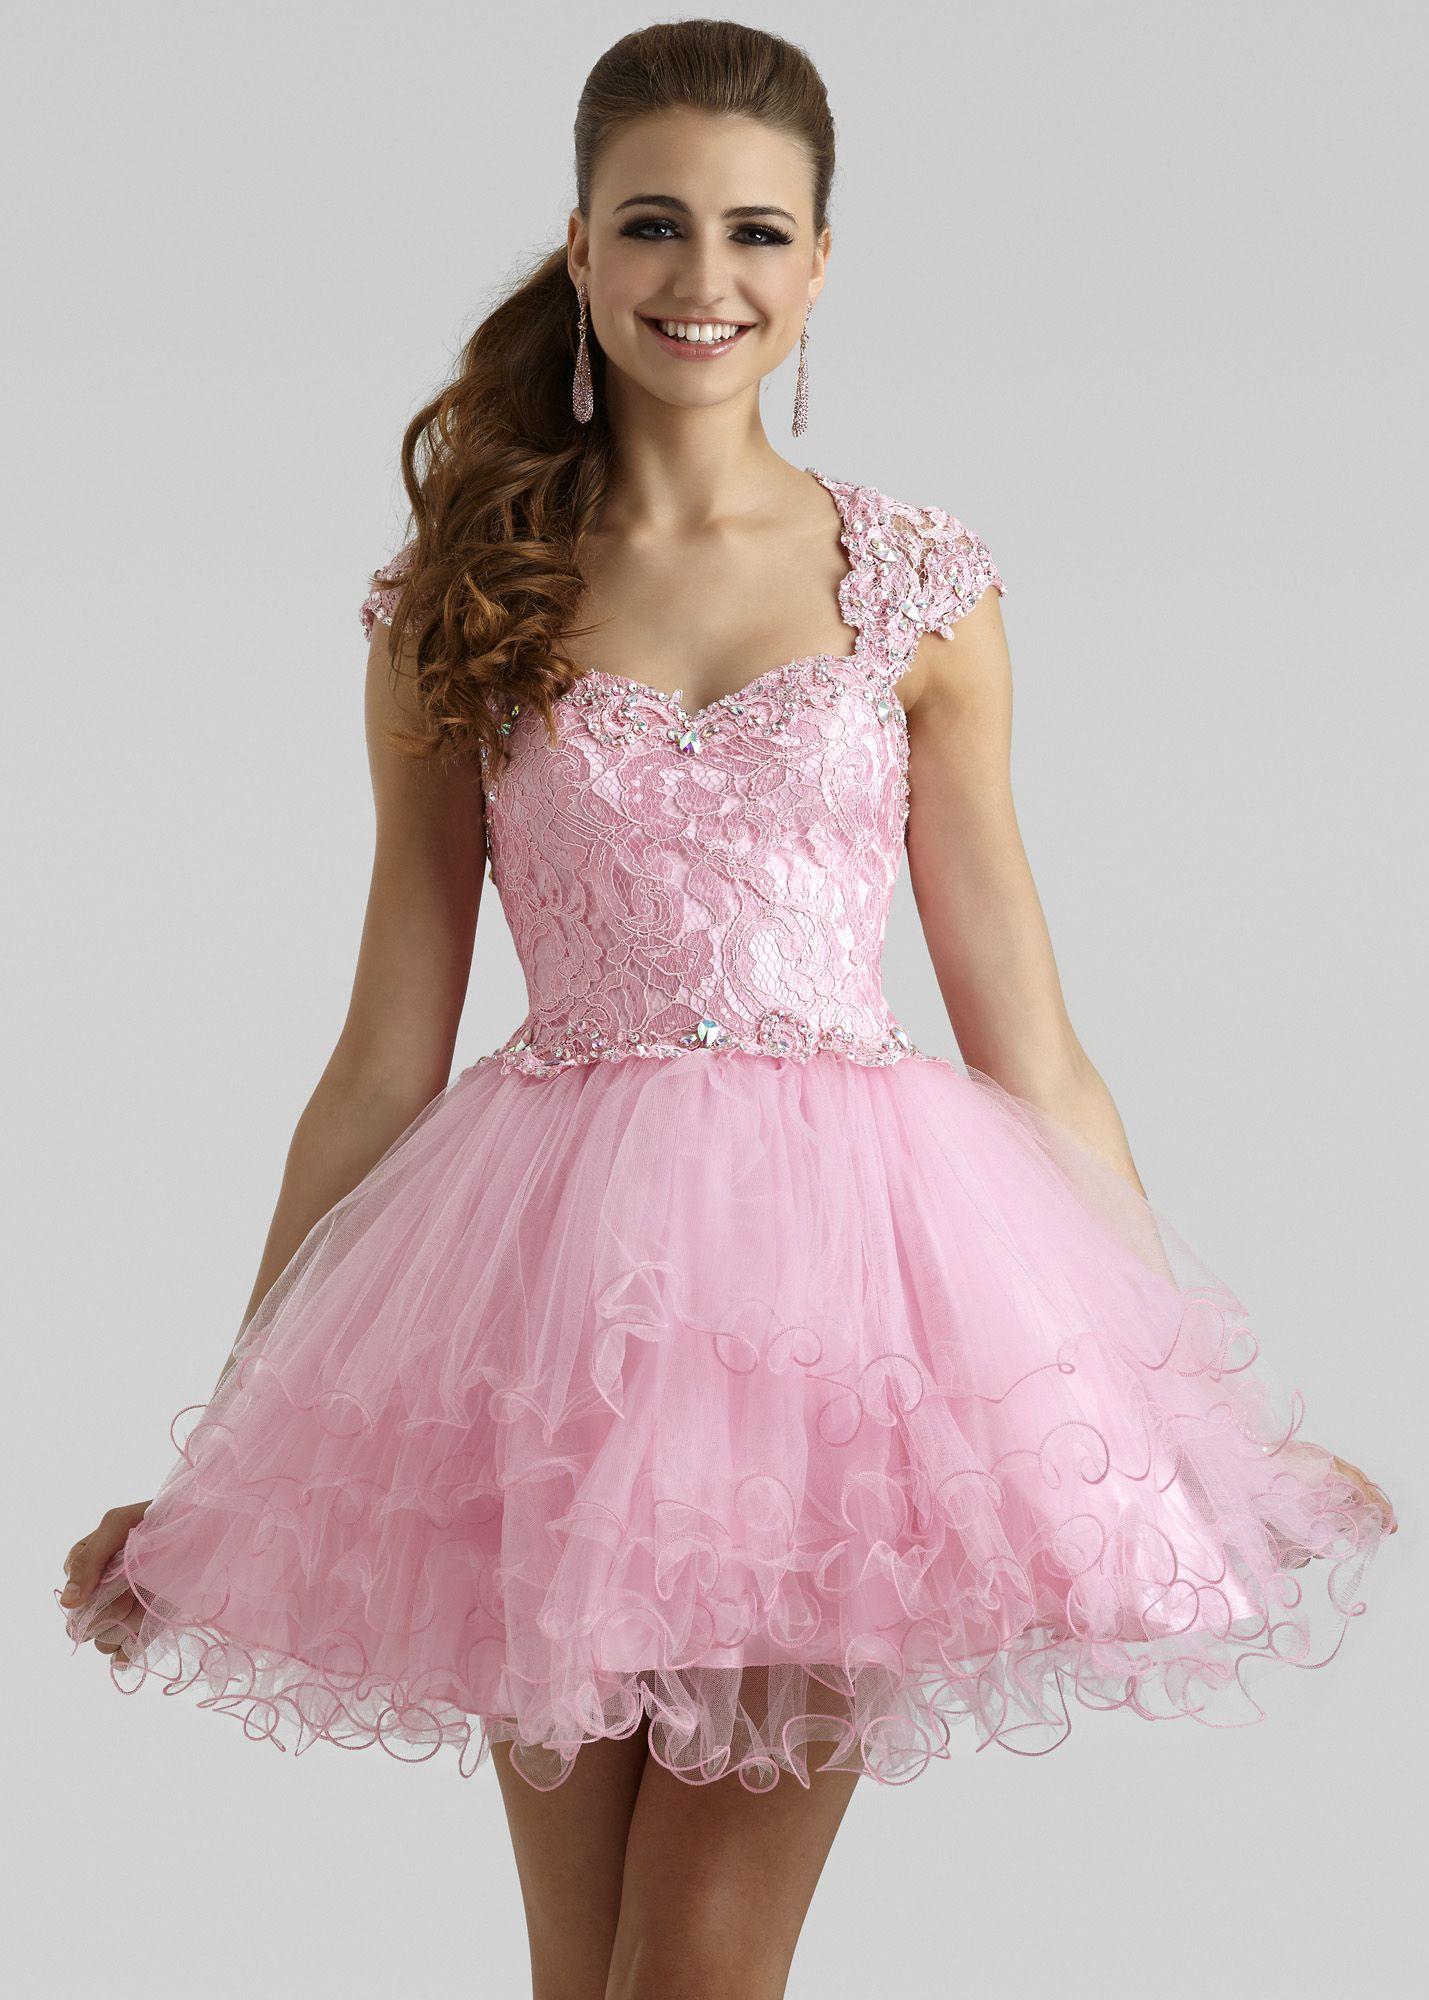 Clarisse 2332 - Princess Pink Lace Short Prom Dress | Short & Sassy ...